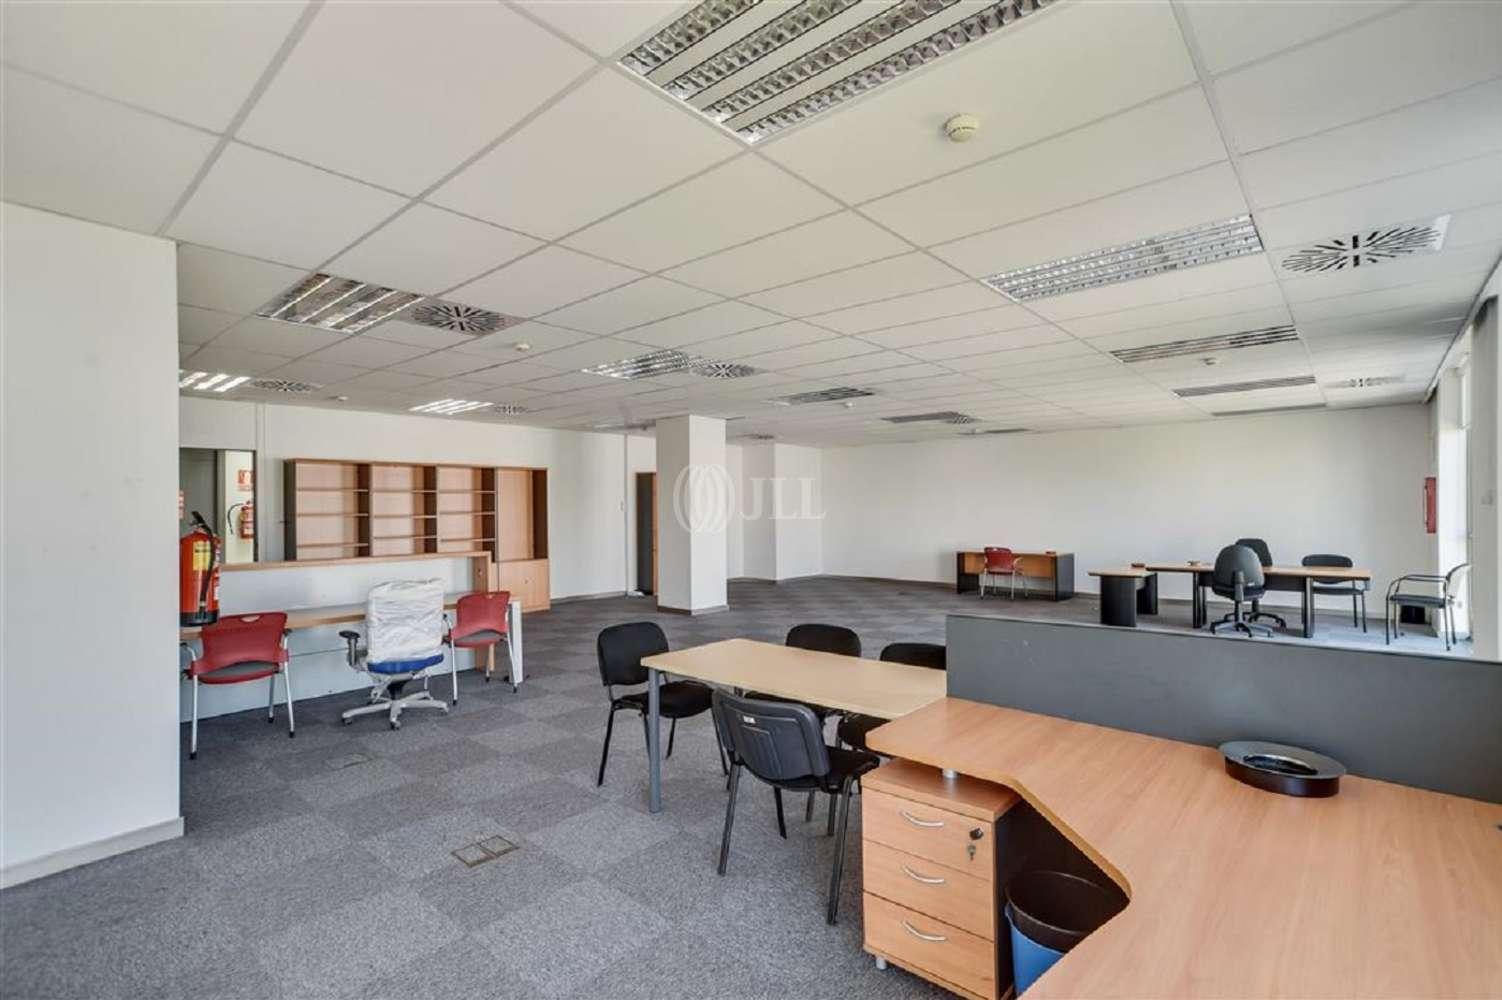 Oficina Sant just desvern, 08960 - DIAGONAL SANT JUST - Edificio A - 24874